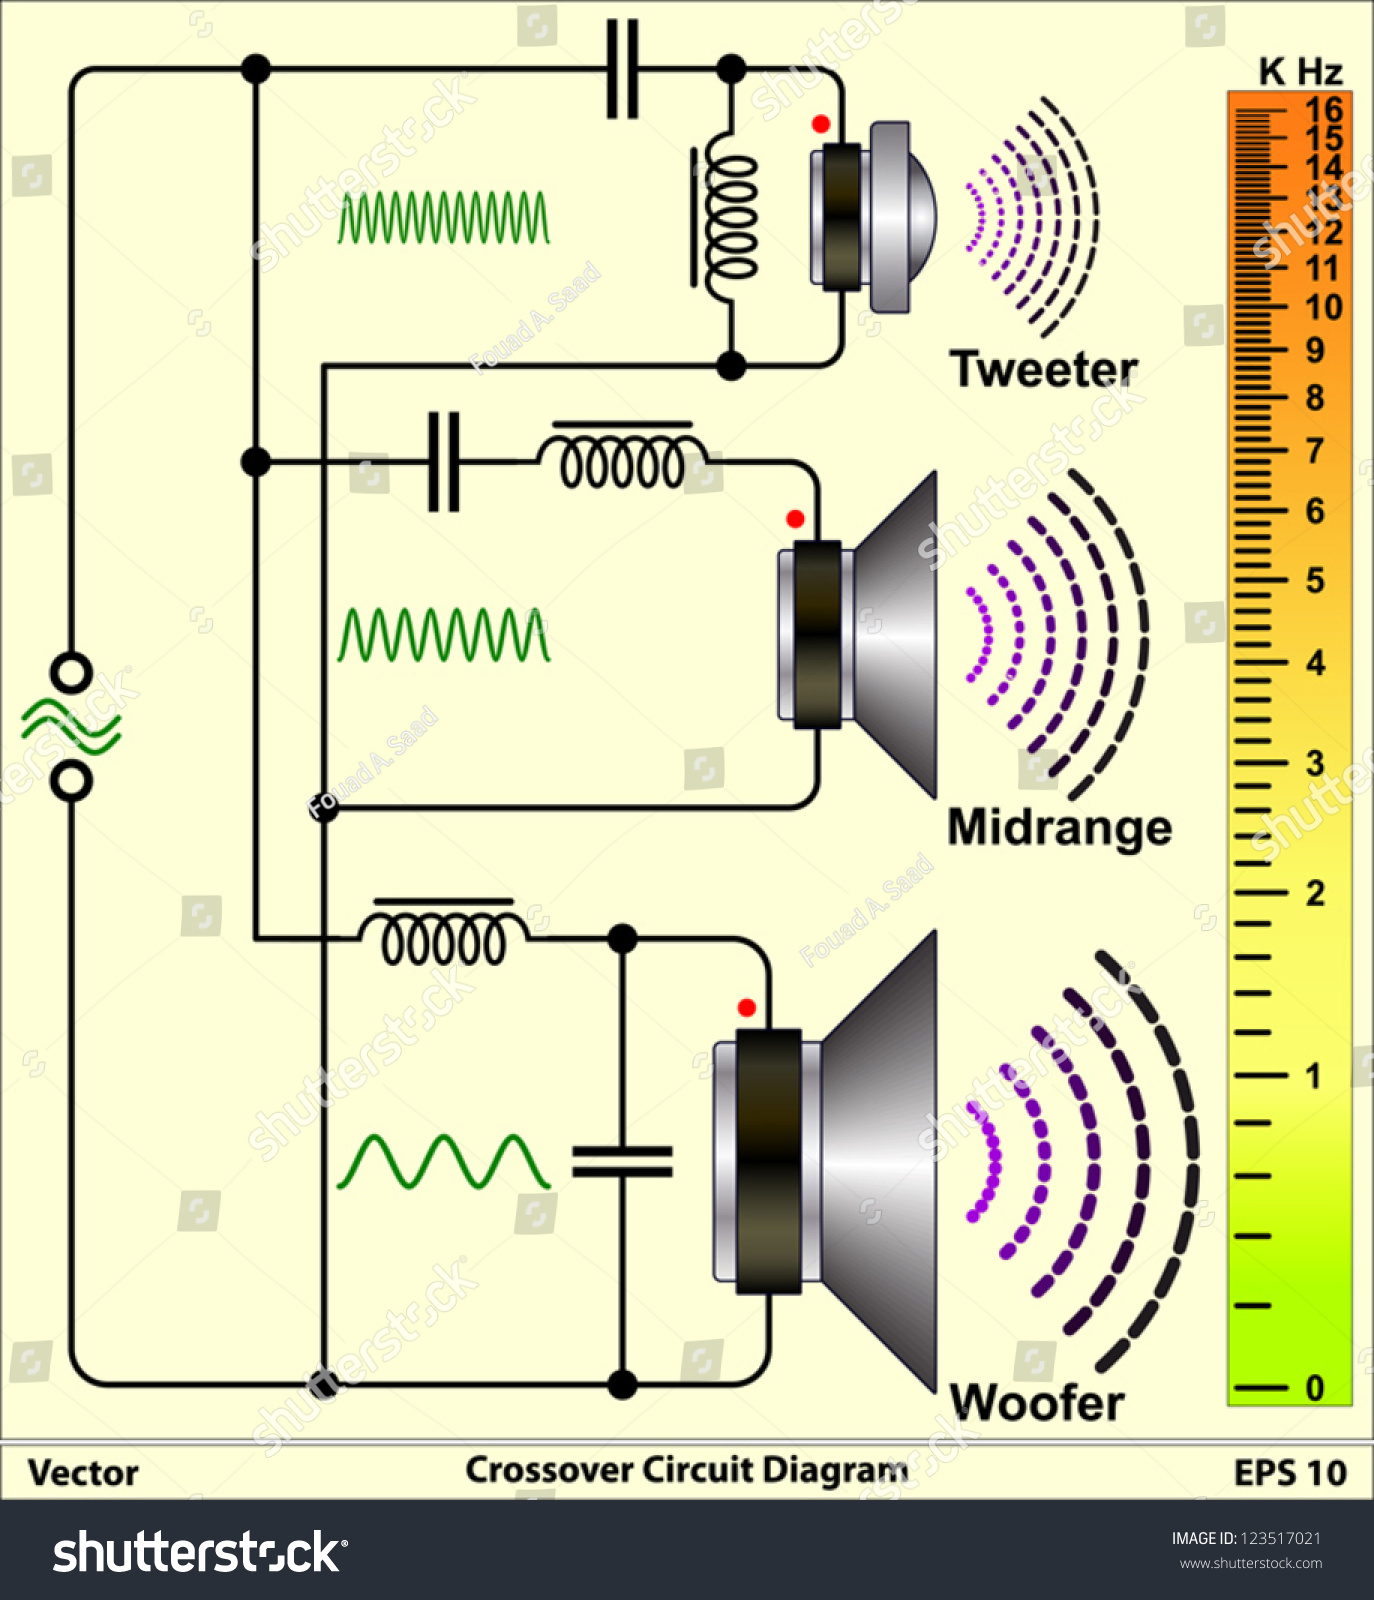 speaker crossovers circuit diagram stock vector royalty free rh shutterstock com speaker diagram for 2012 camry speaker diagram for 2012 camry